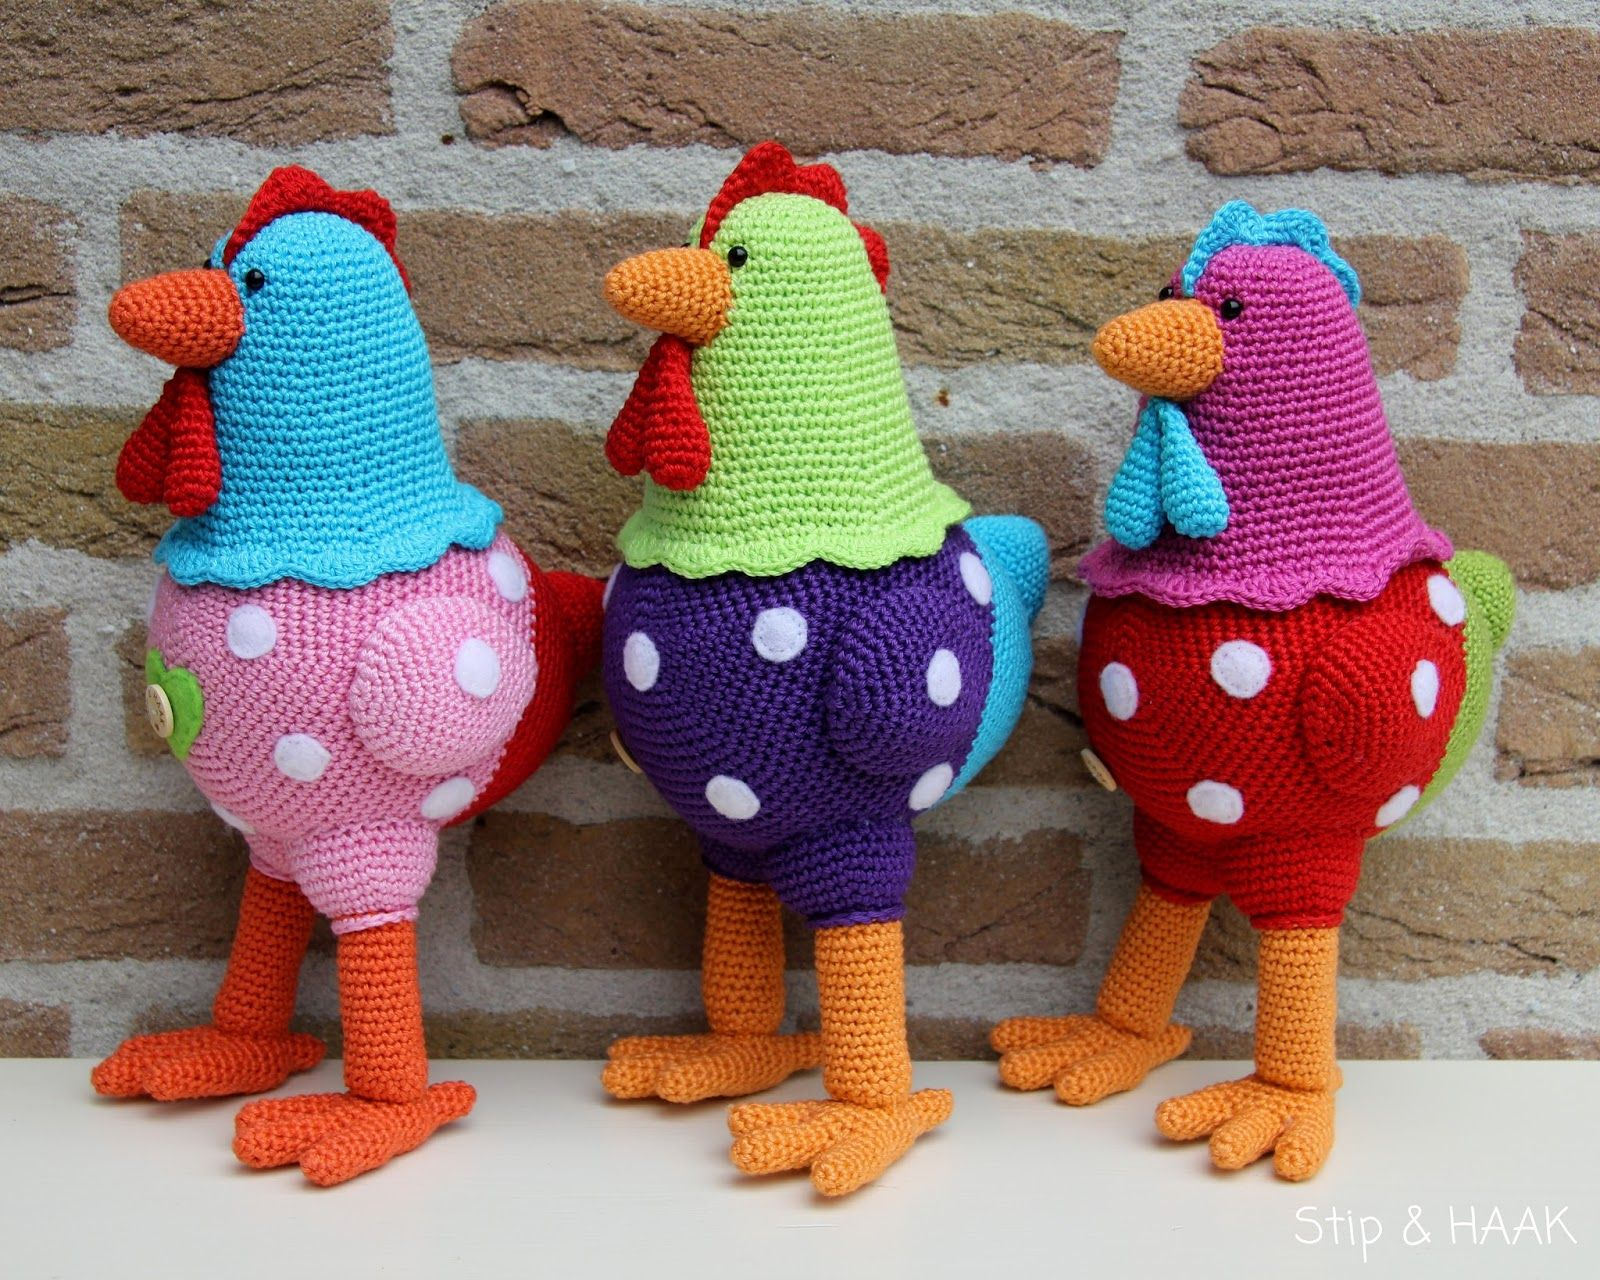 Stip HAAK: Kakelbonte kippen | Haakpatroon | Pinterest | Gehäkelte ...